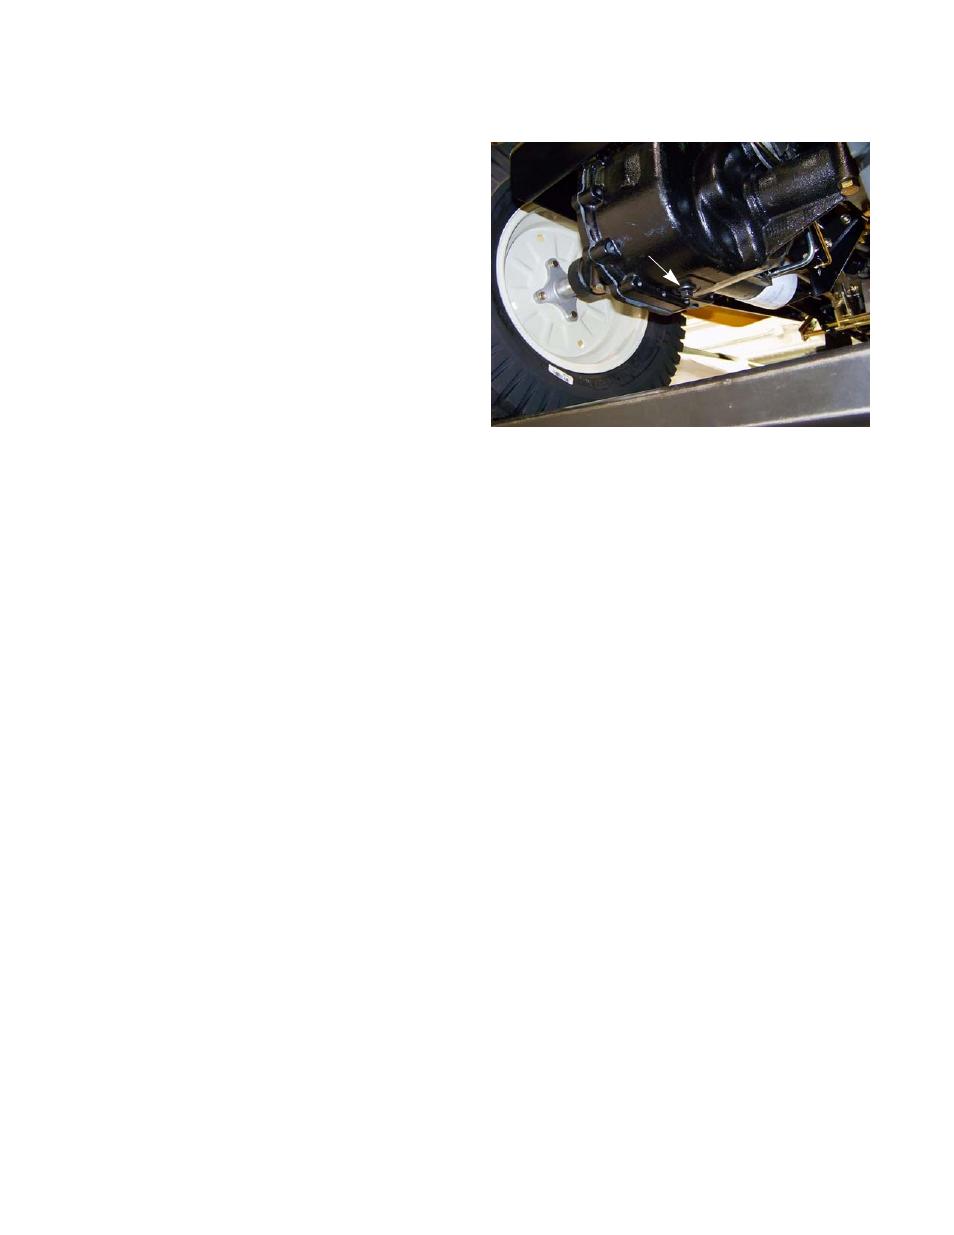 Transmission fluid change | Cub Cadet 2000 Series User Manual | Page 46 /  194